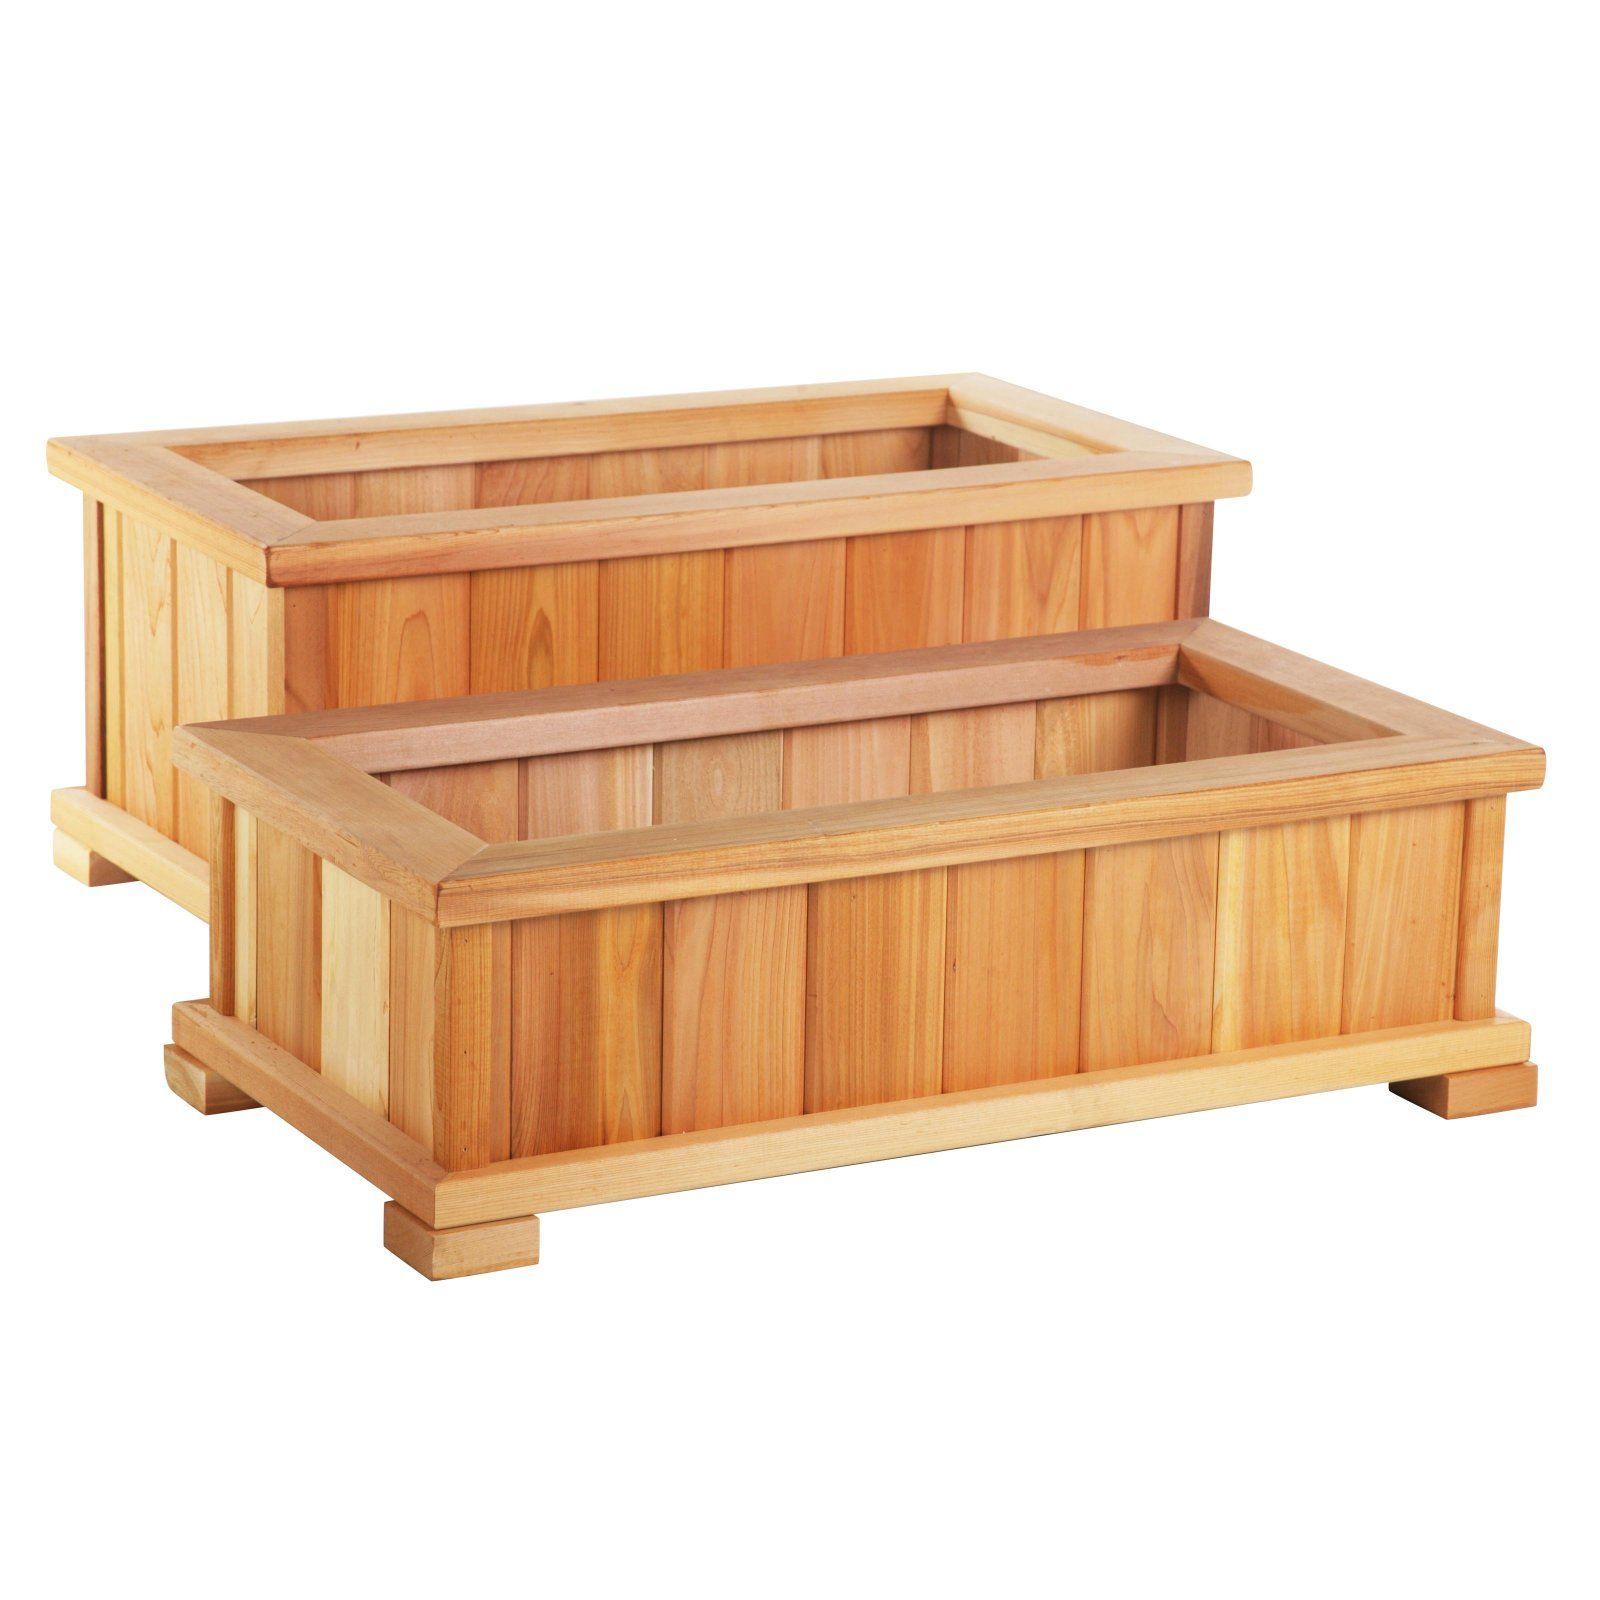 hight resolution of wooden planter box